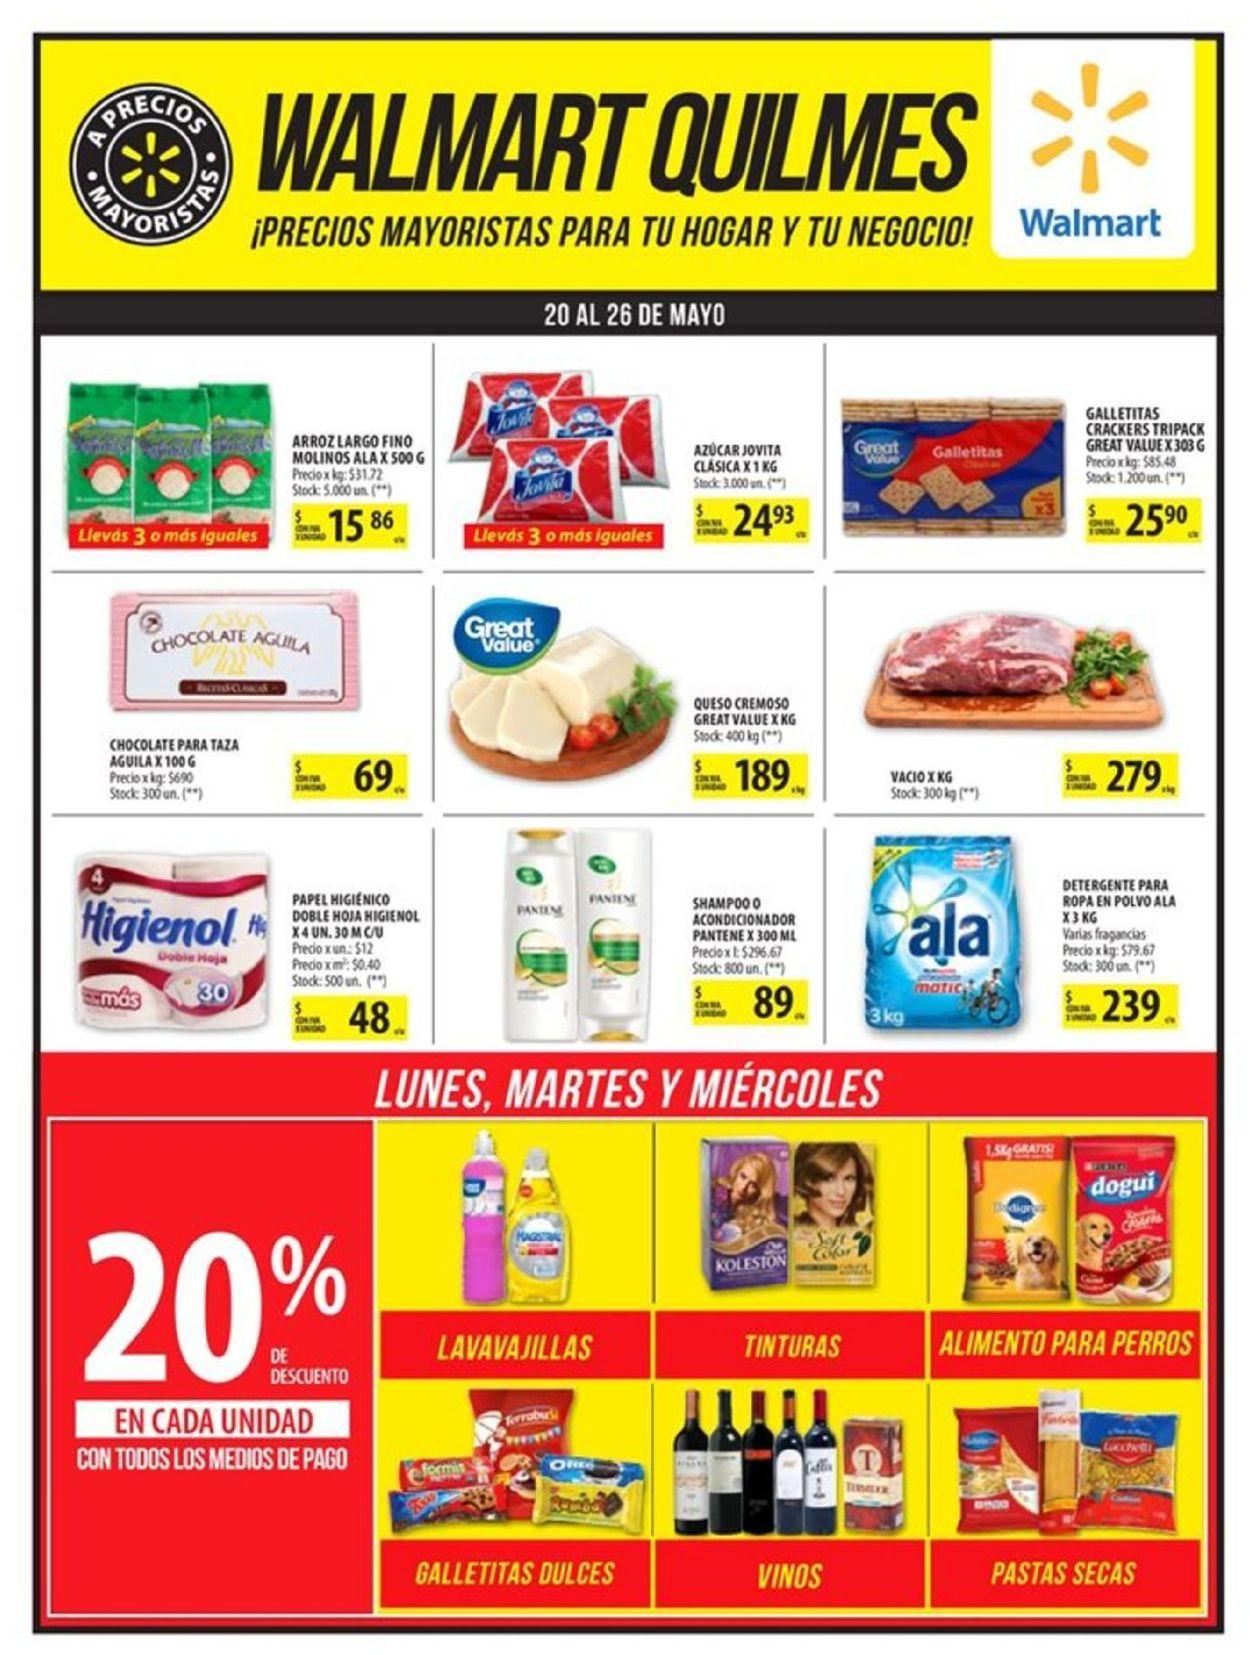 Walmart Folleto - 20.05-26.05.2019